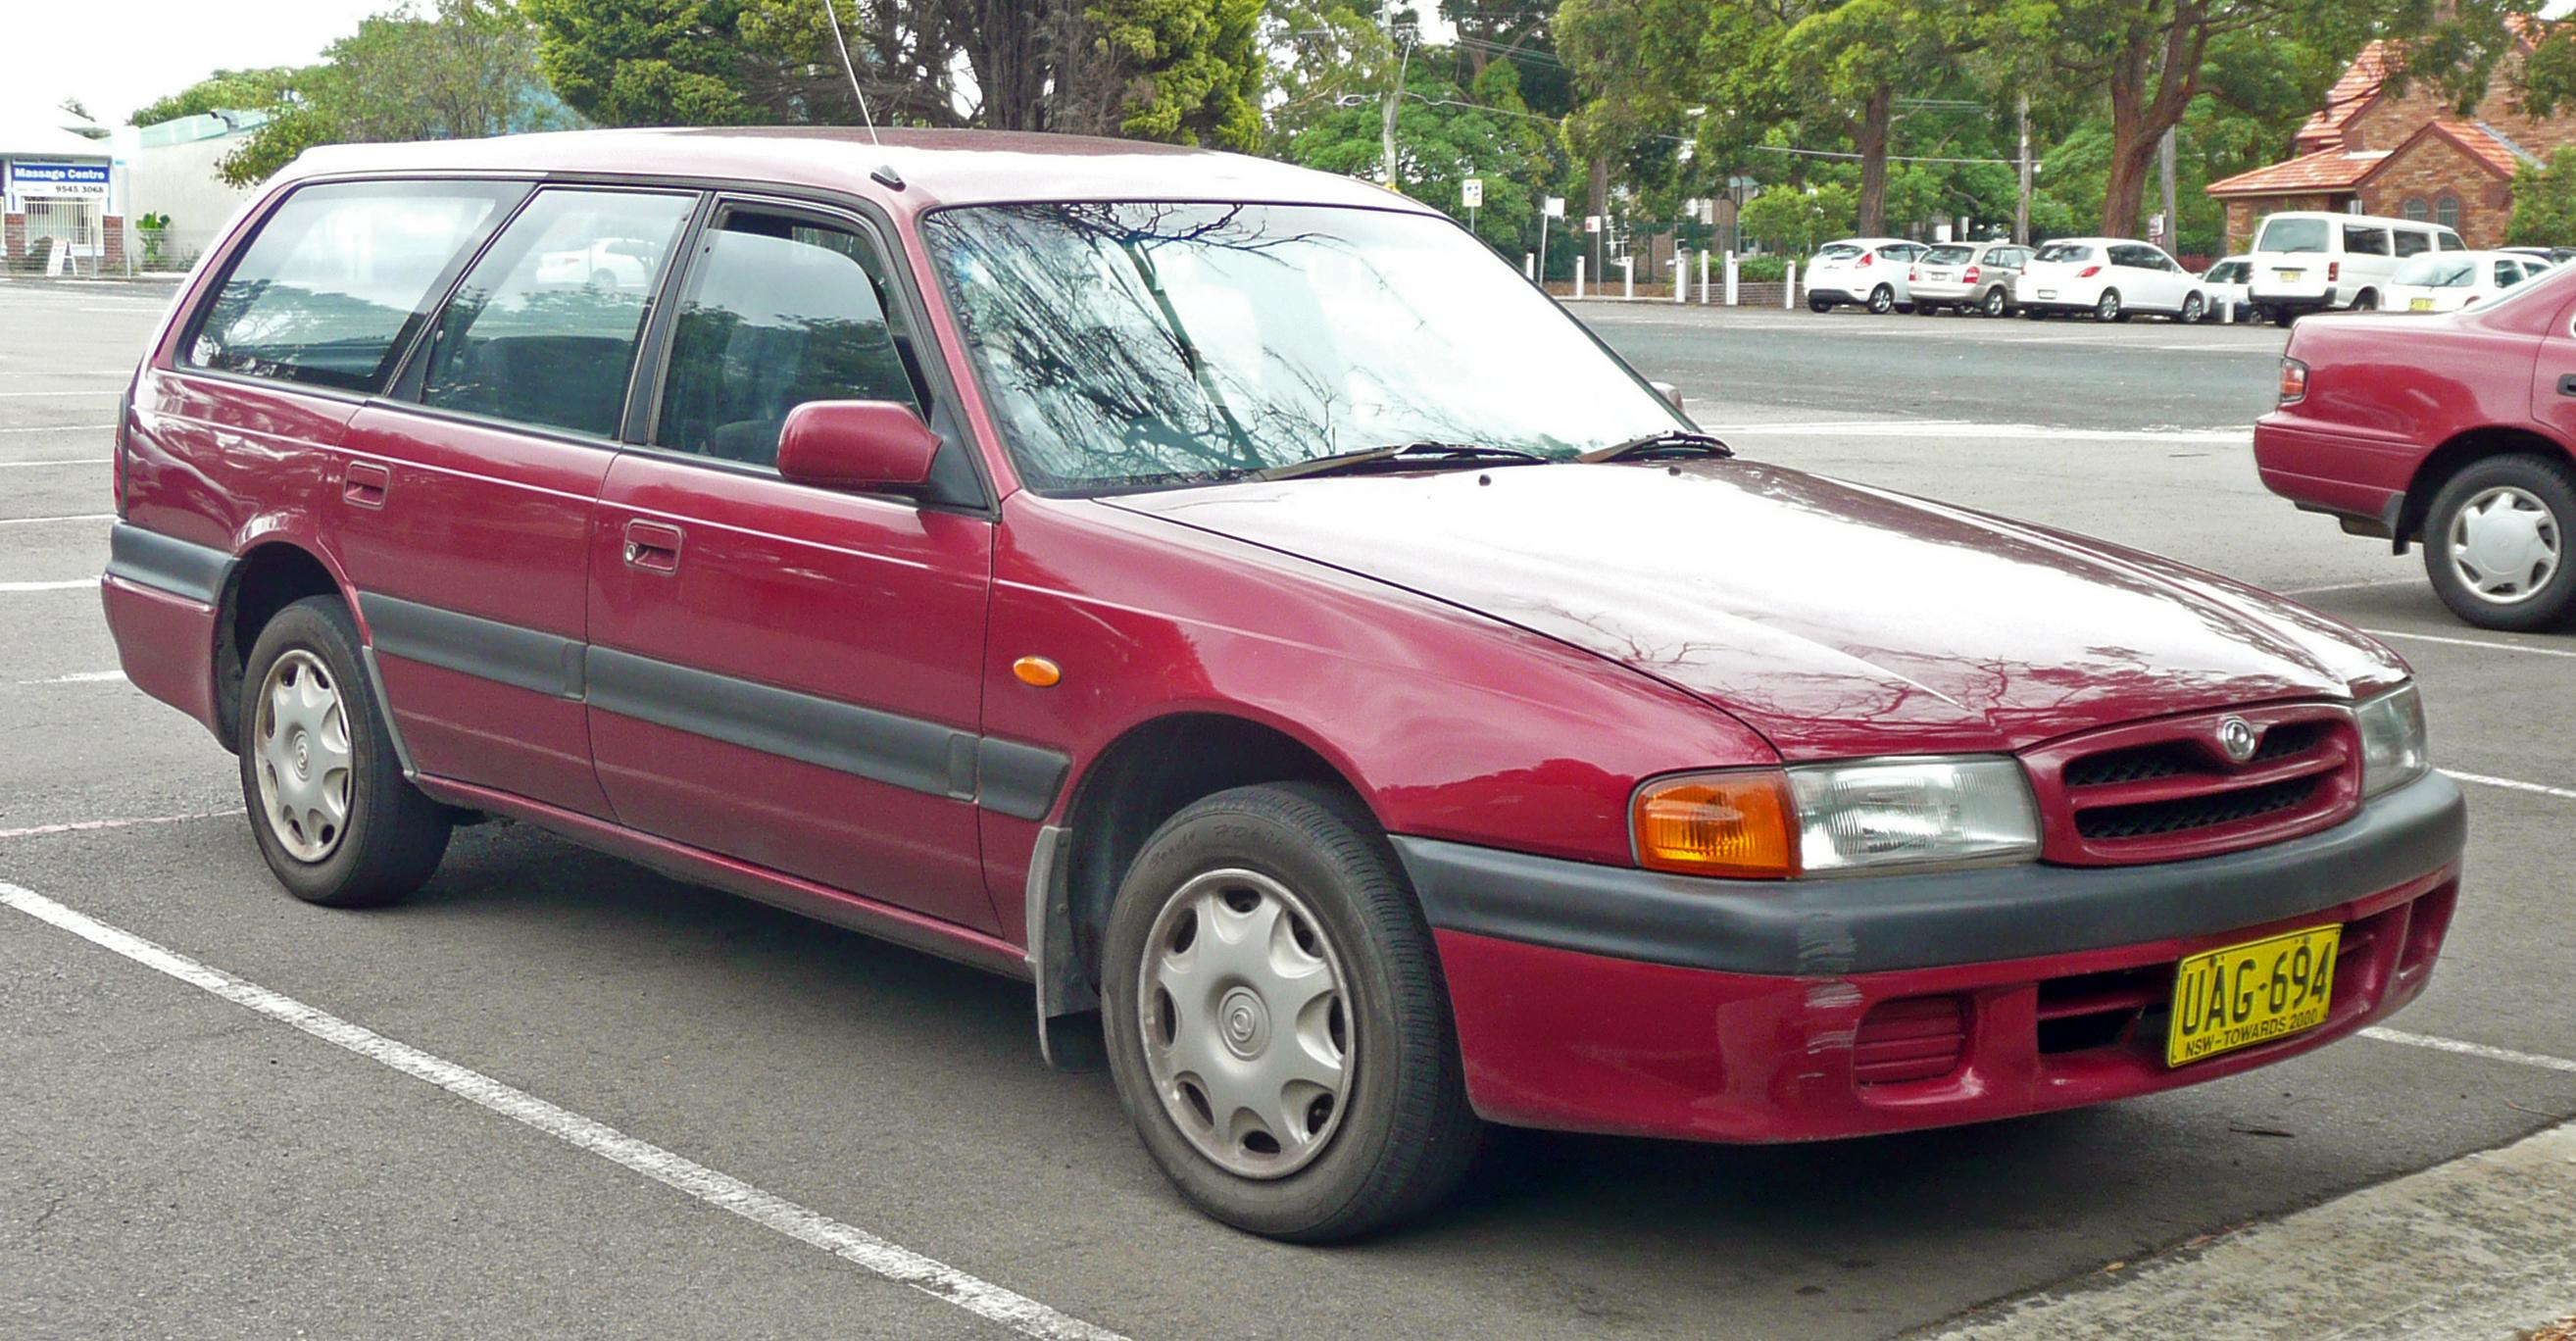 file 1995 mazda 626 gv series 4 station wagon 2006 12 20 01 jpg rh commons wikimedia org Mazda 6 Wagon Mazda 626 Liftback